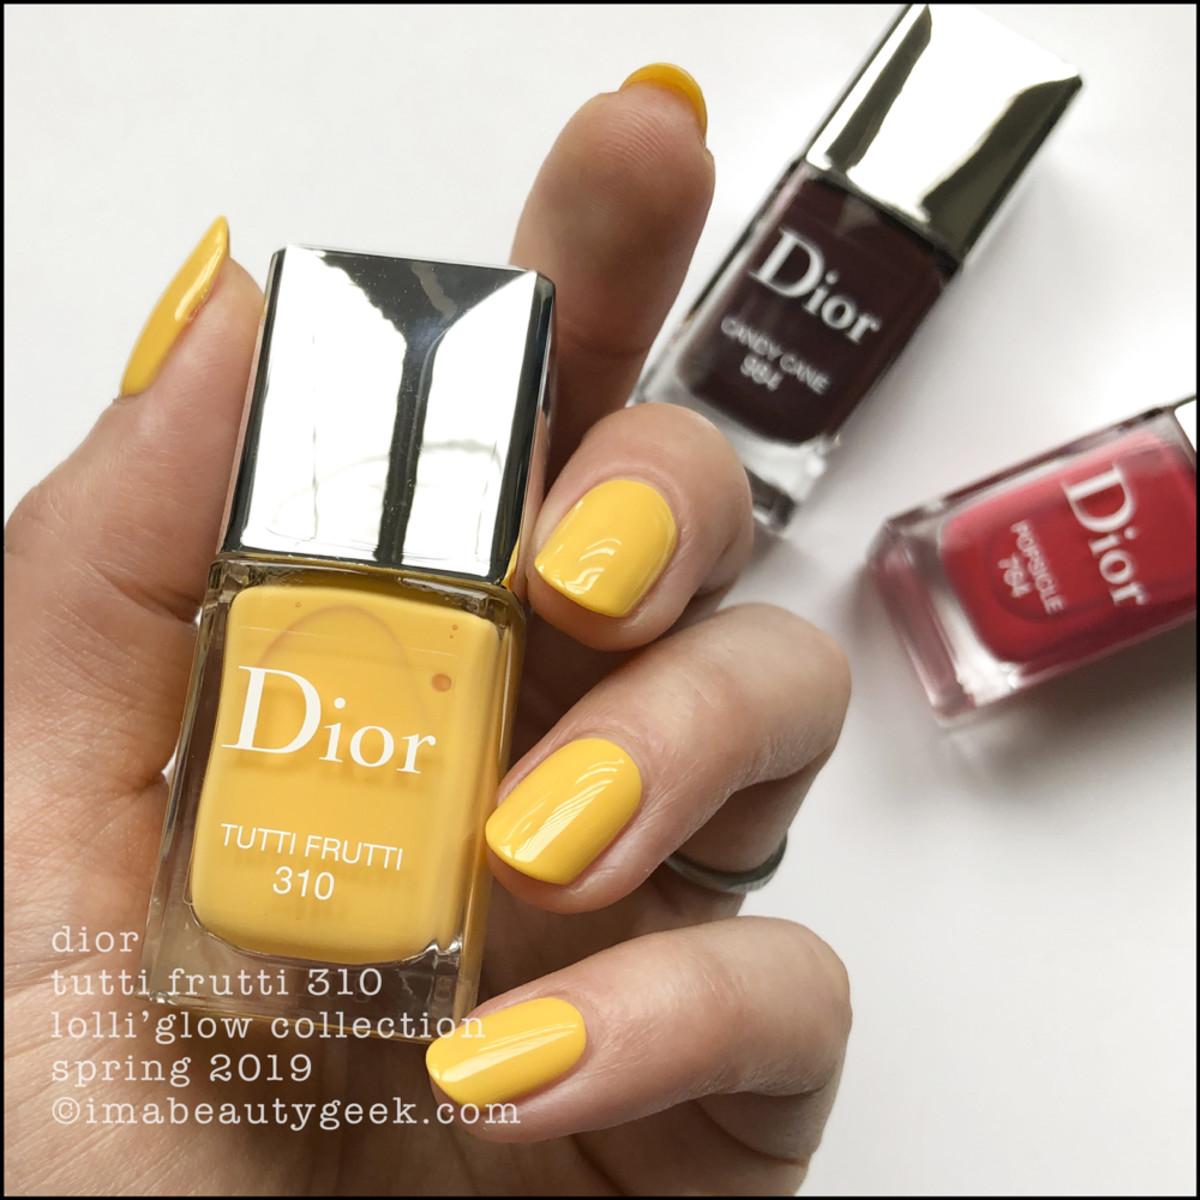 Dior Tutti Fruitti 310 - Dior Lolli'Glow Swatches Spring 2019